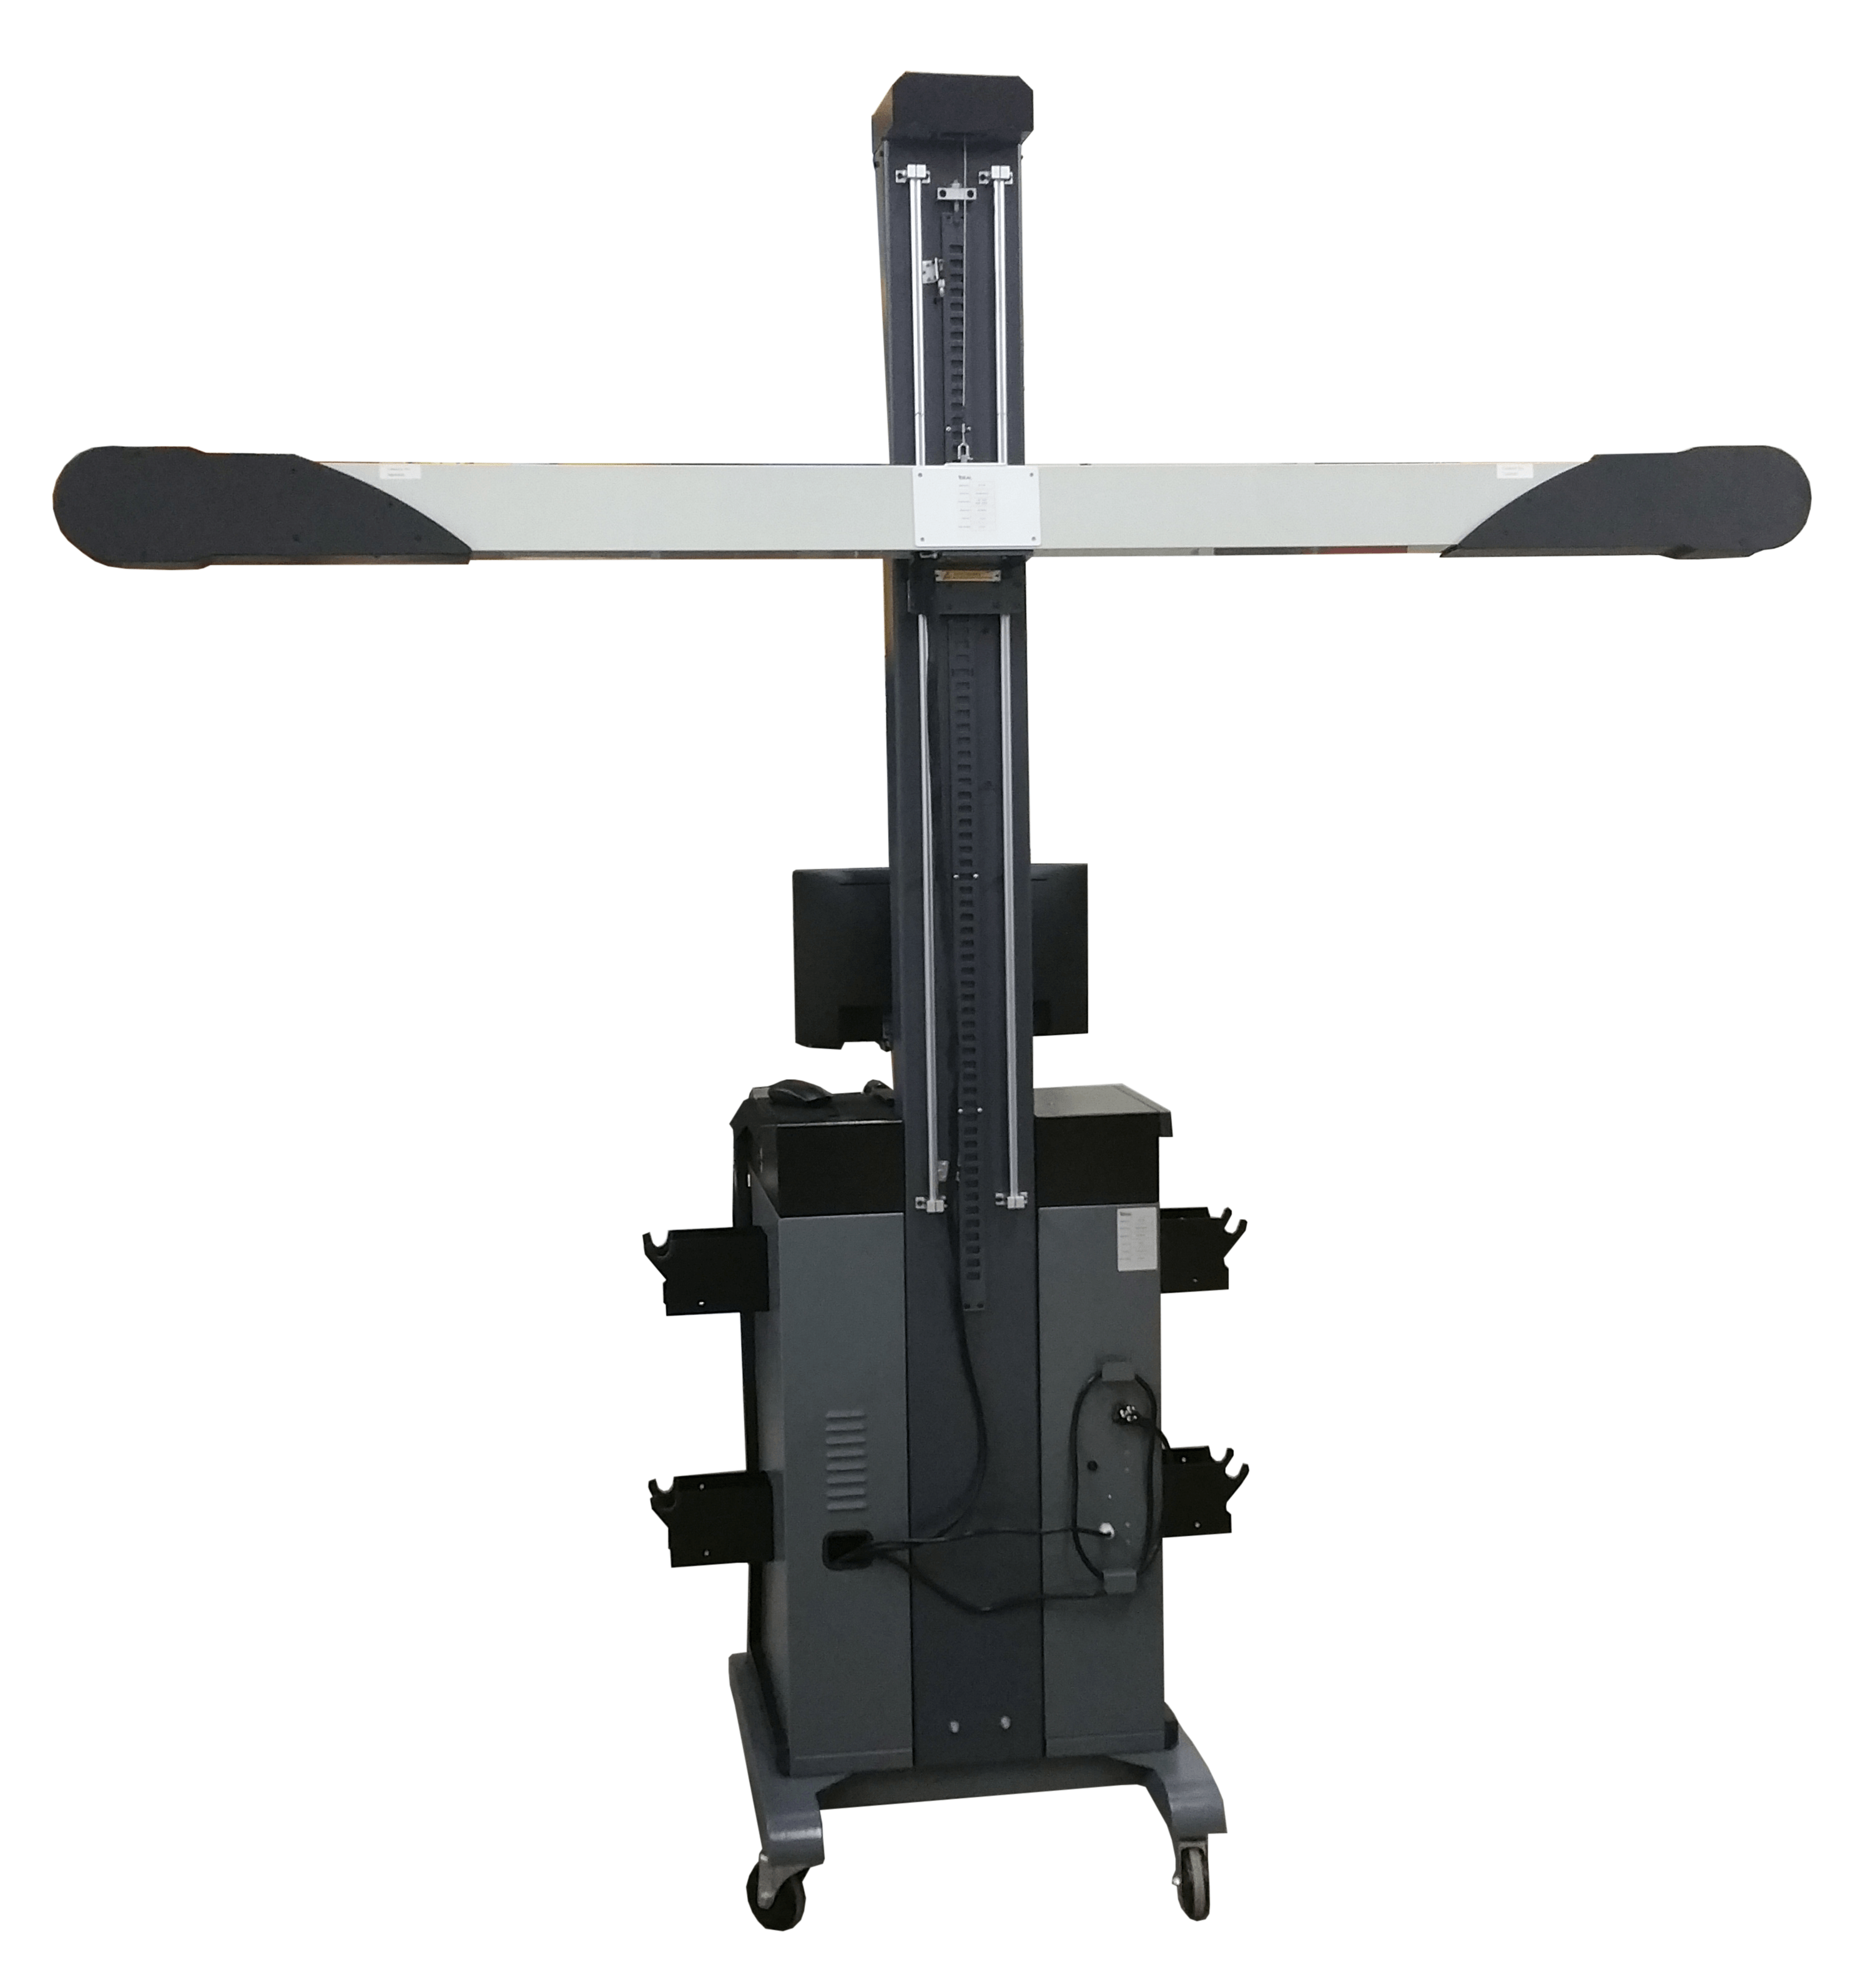 iwa-60-1500-4.png